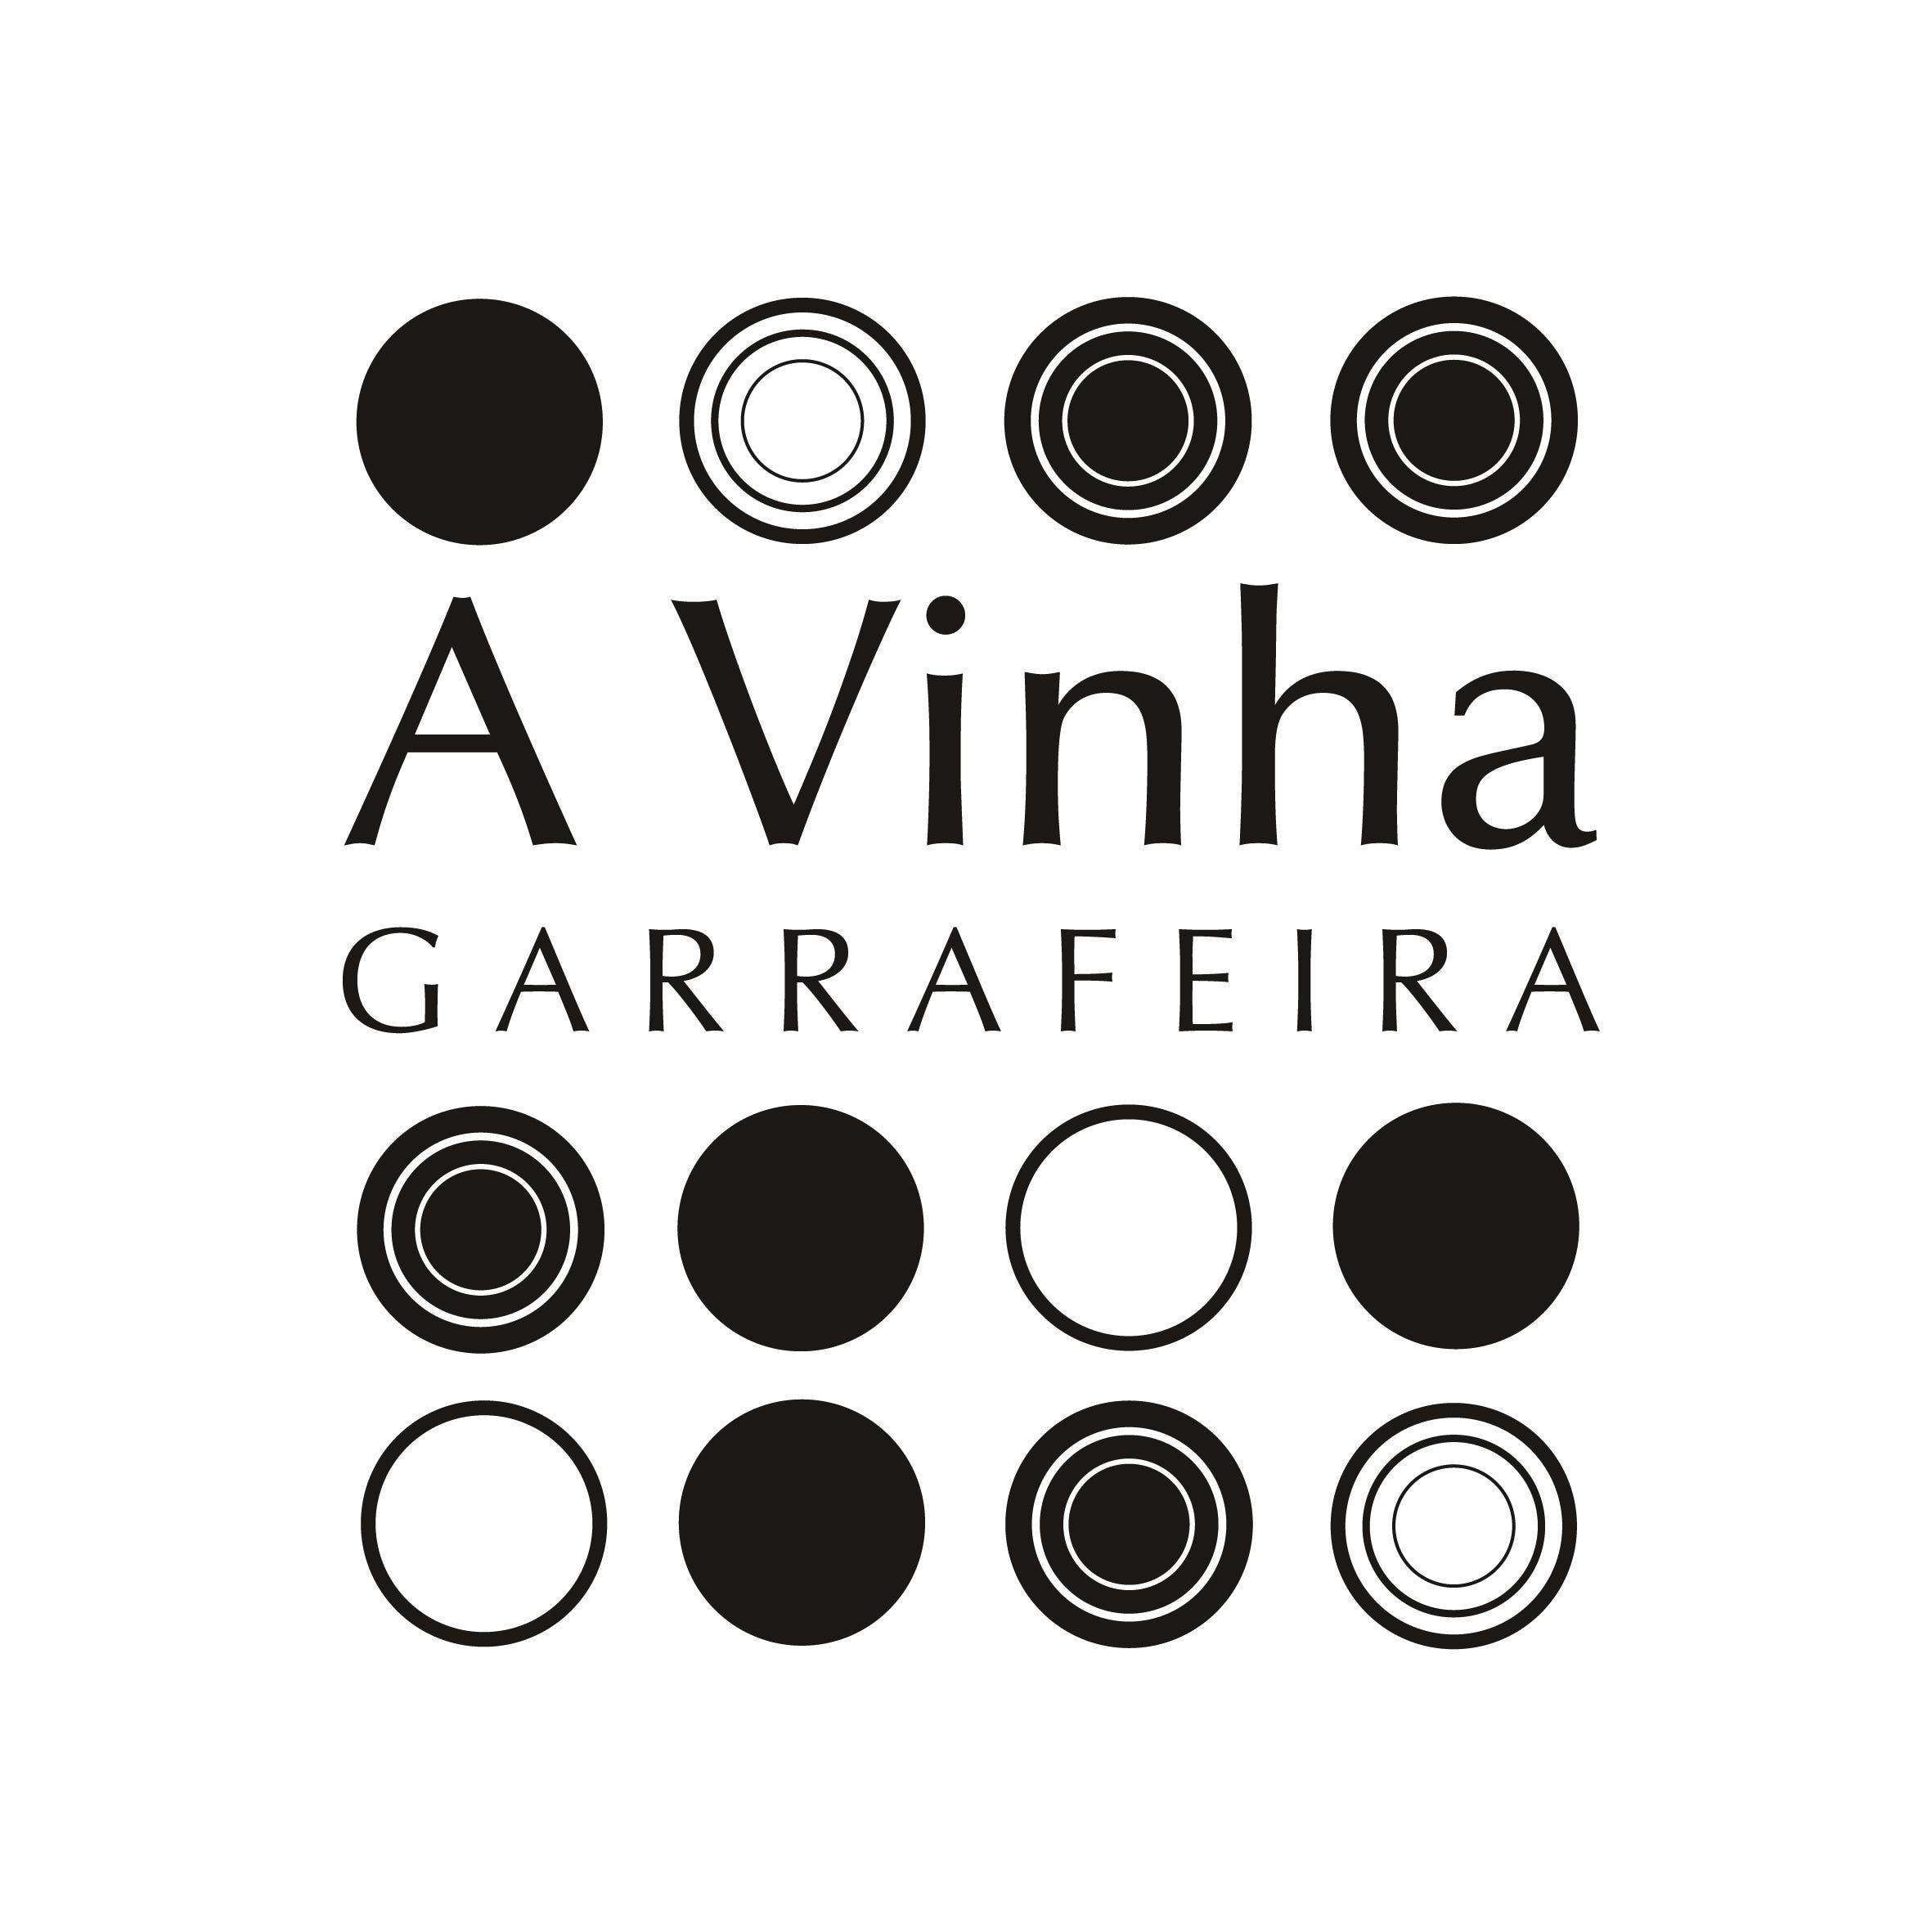 Qta. Jardinete Barrica Carvalho Superior Tinto 75 C 2018